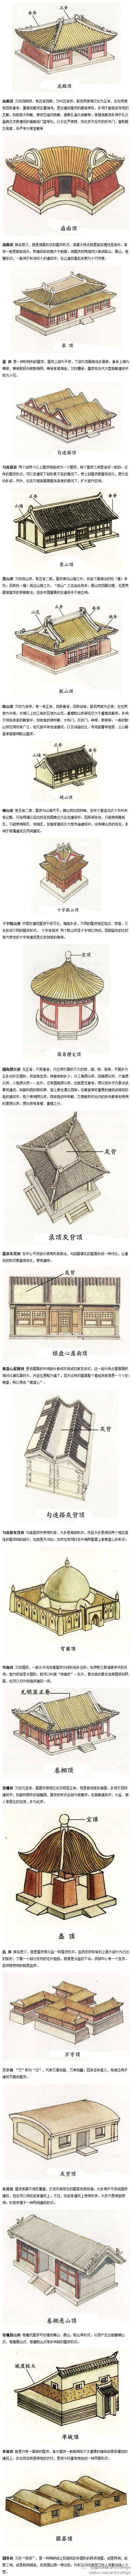 3c9f9a5fb35f4c6e640b36dbb3e44980--chinese-building-chinese-architecture Spannende 40 Fuß Meter Dekorationen